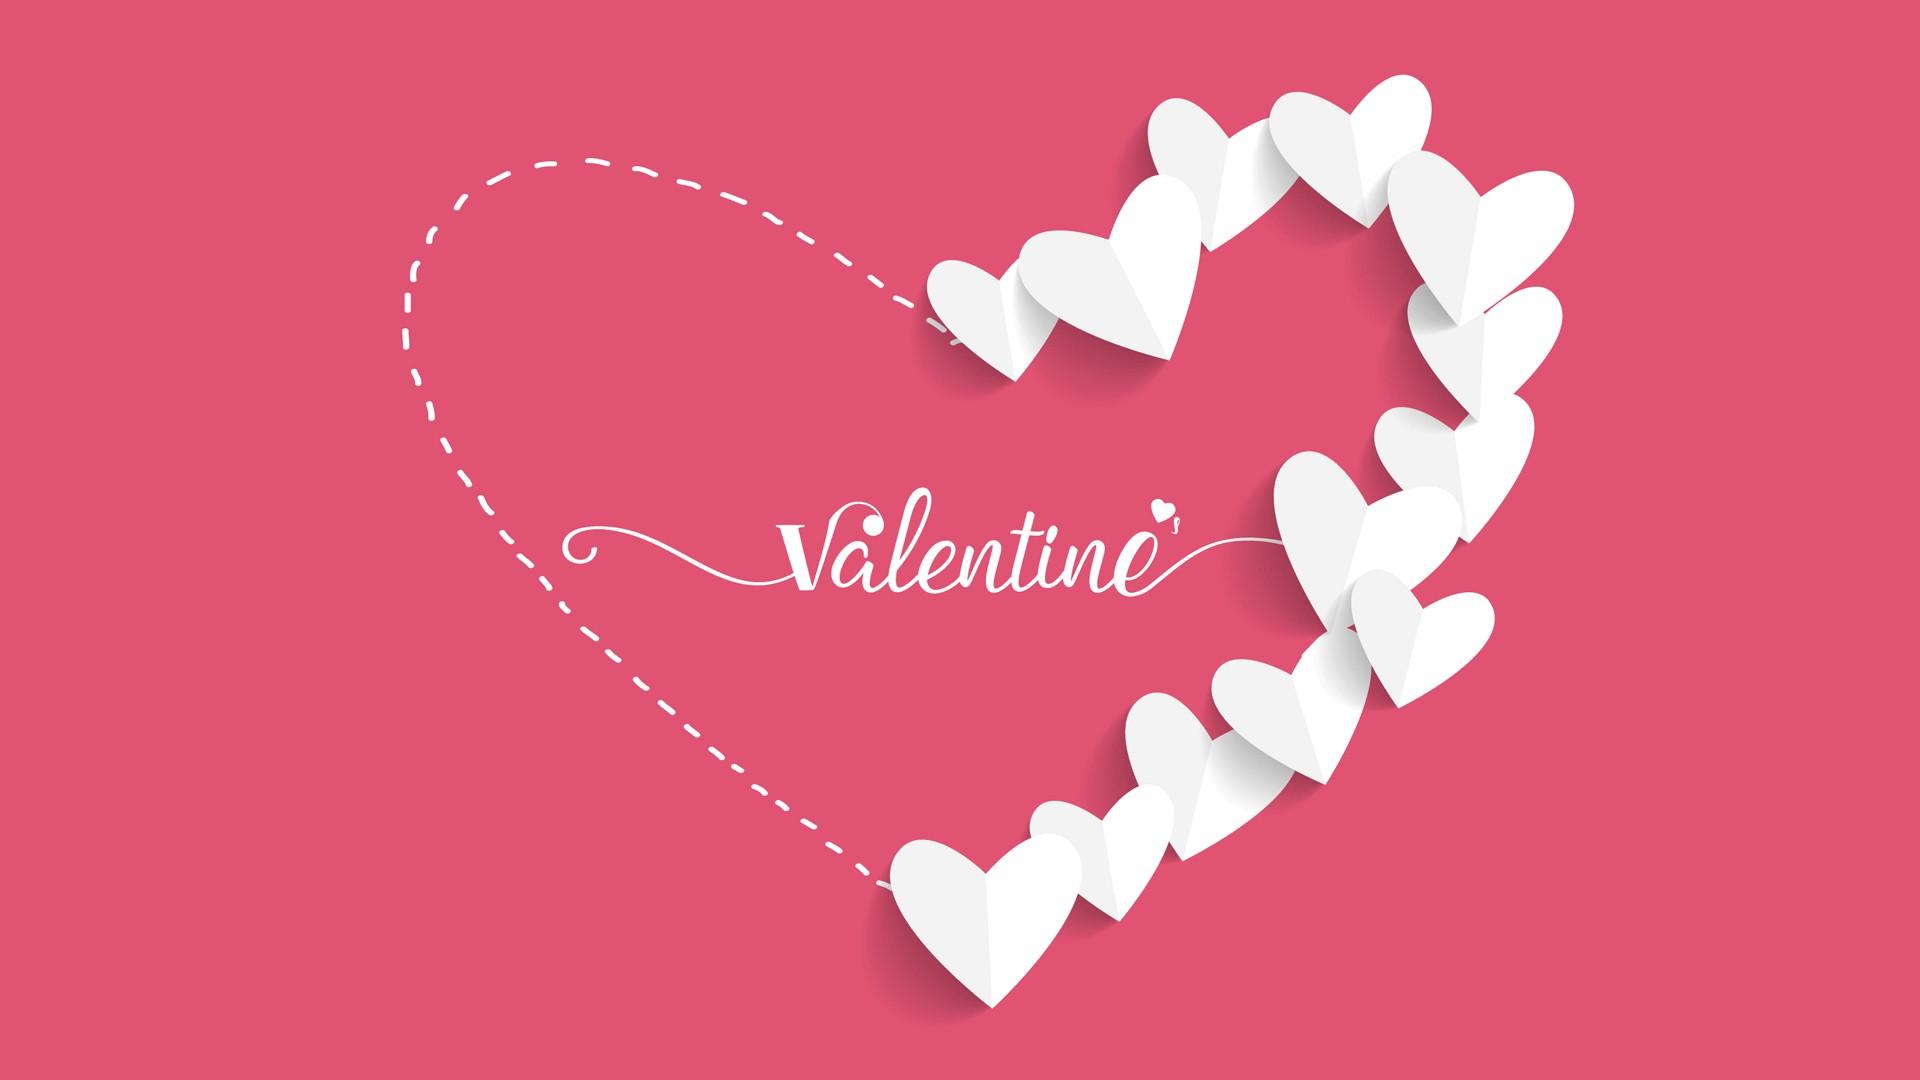 Details - Valentine Wallpaper Hd , HD Wallpaper & Backgrounds